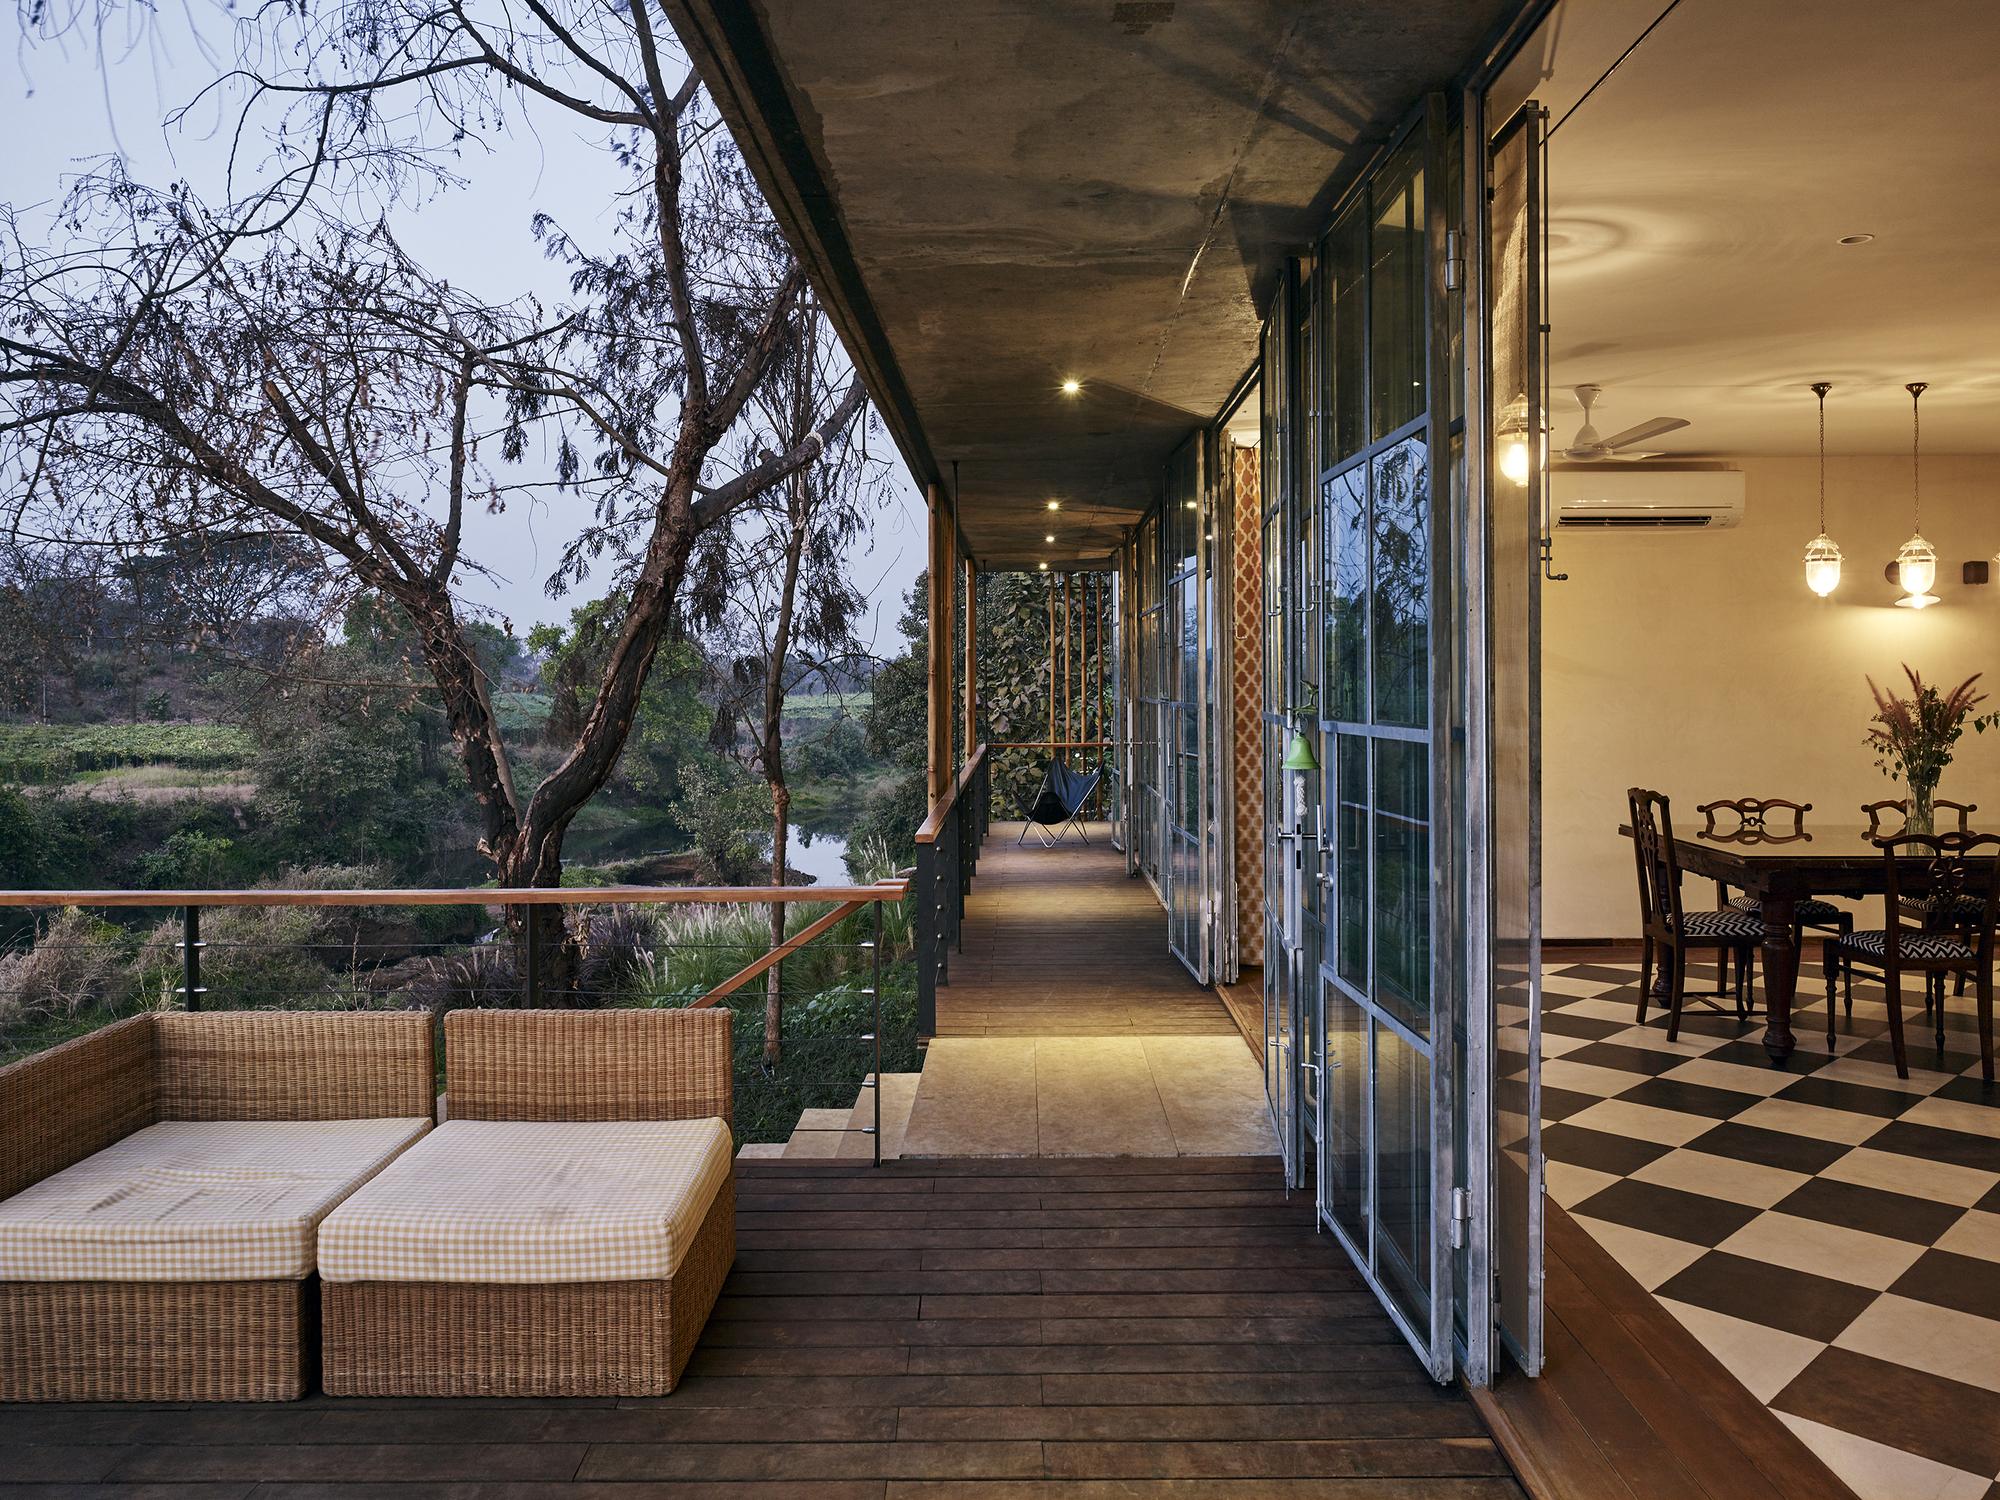 House design near river - Ariel Huber Edit Images